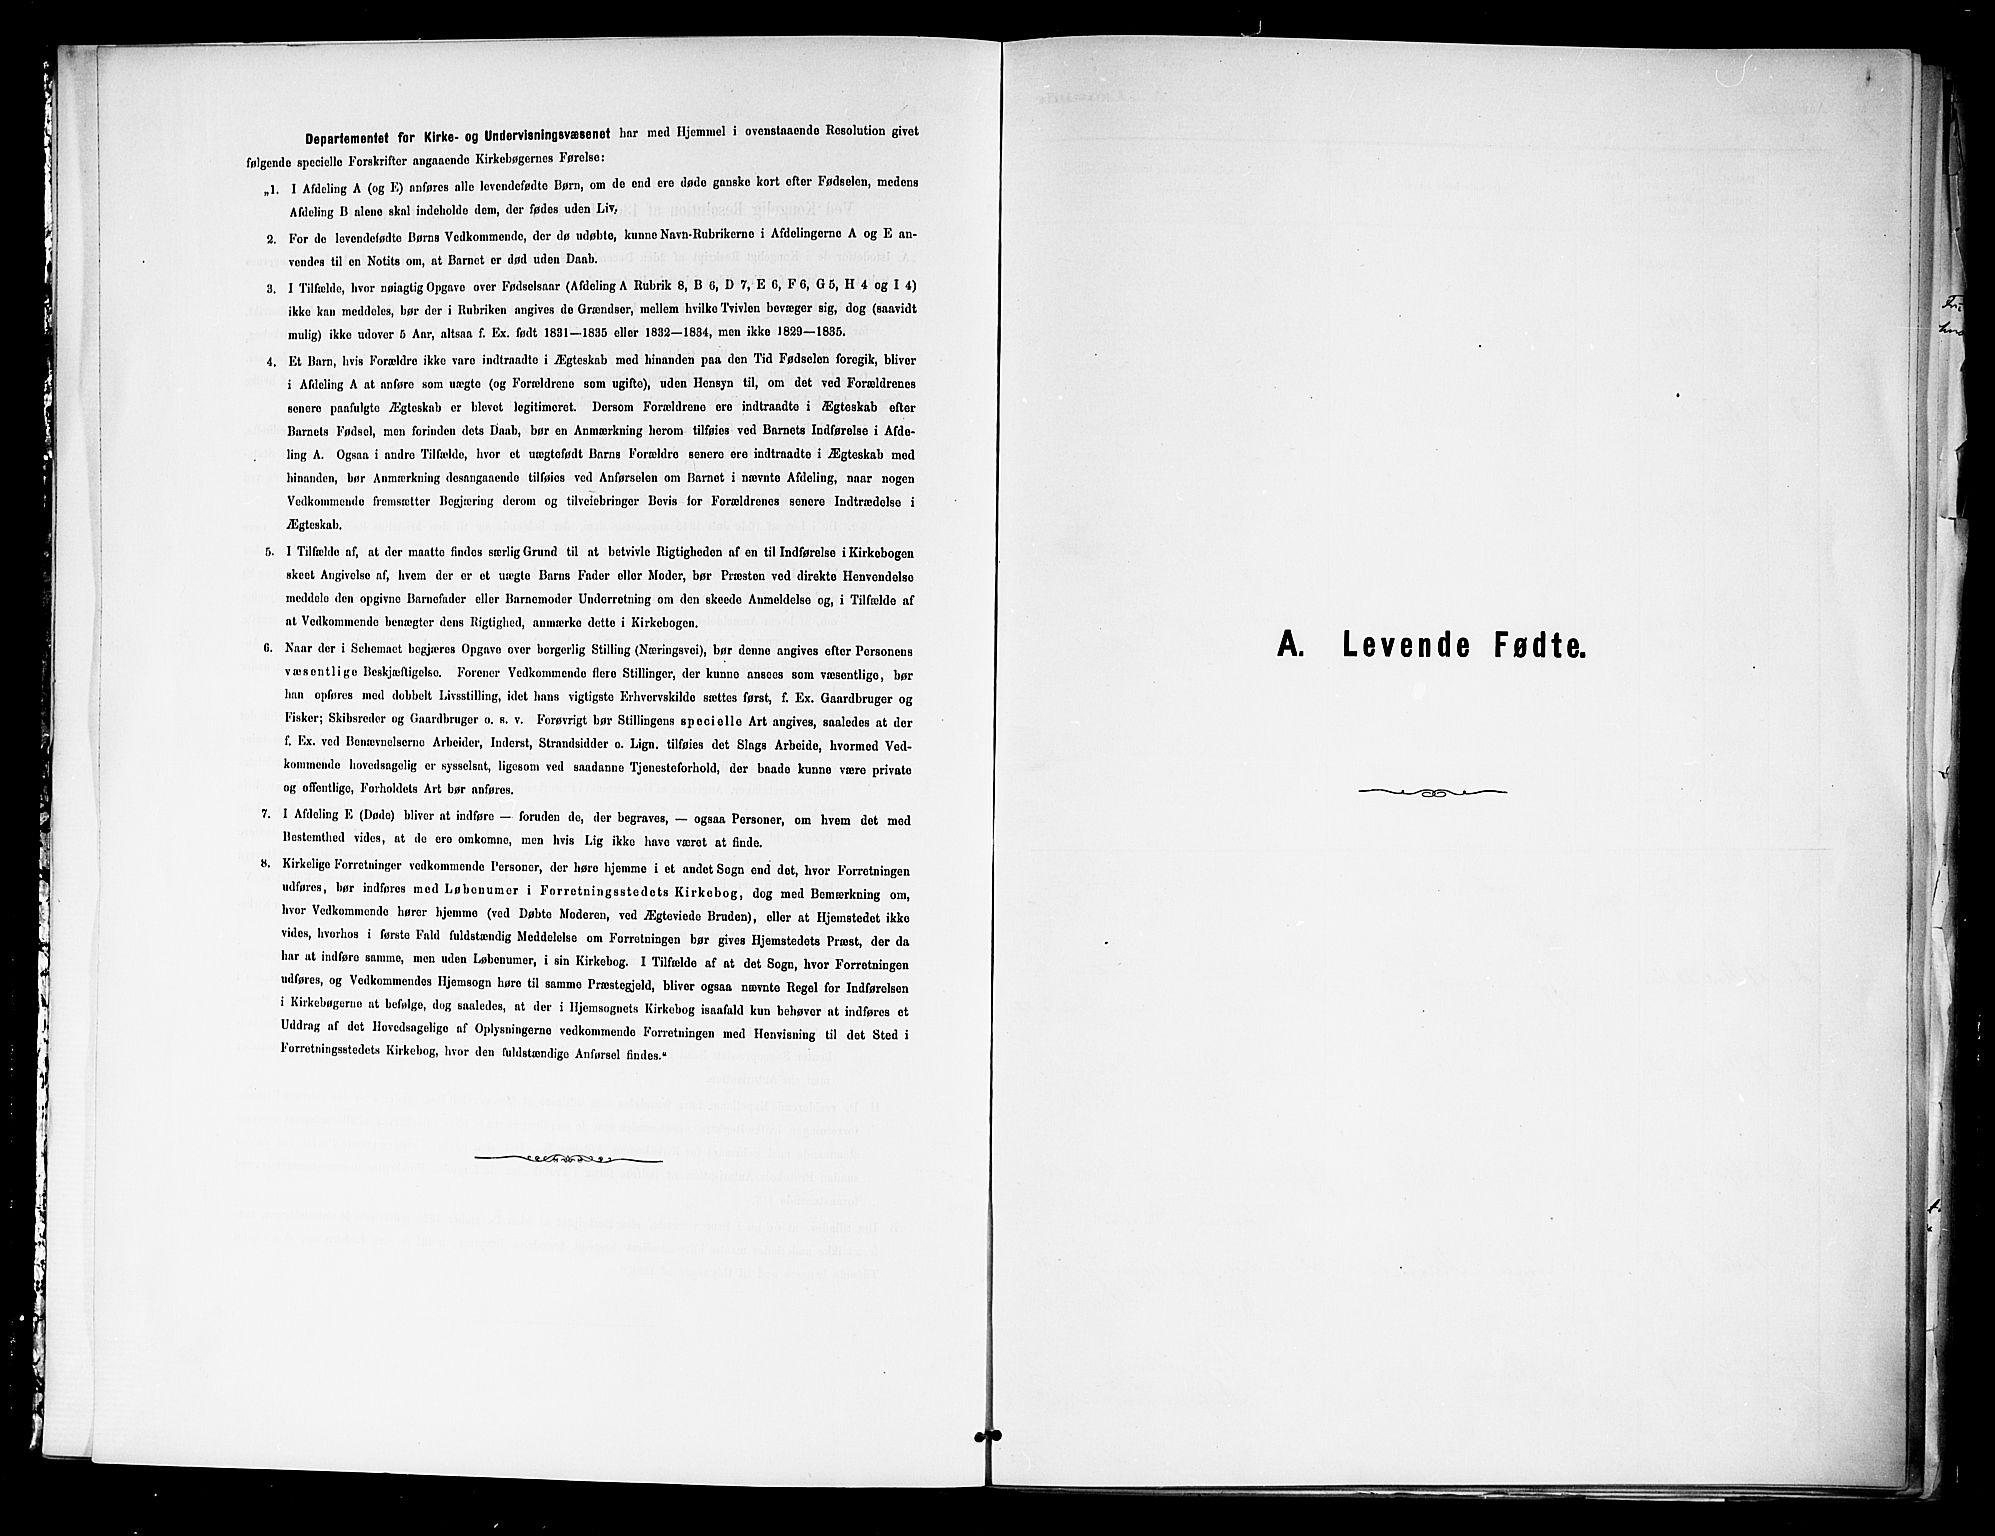 SAKO, Holla kirkebøker, F/Fa/L0009: Ministerialbok nr. 9, 1881-1897